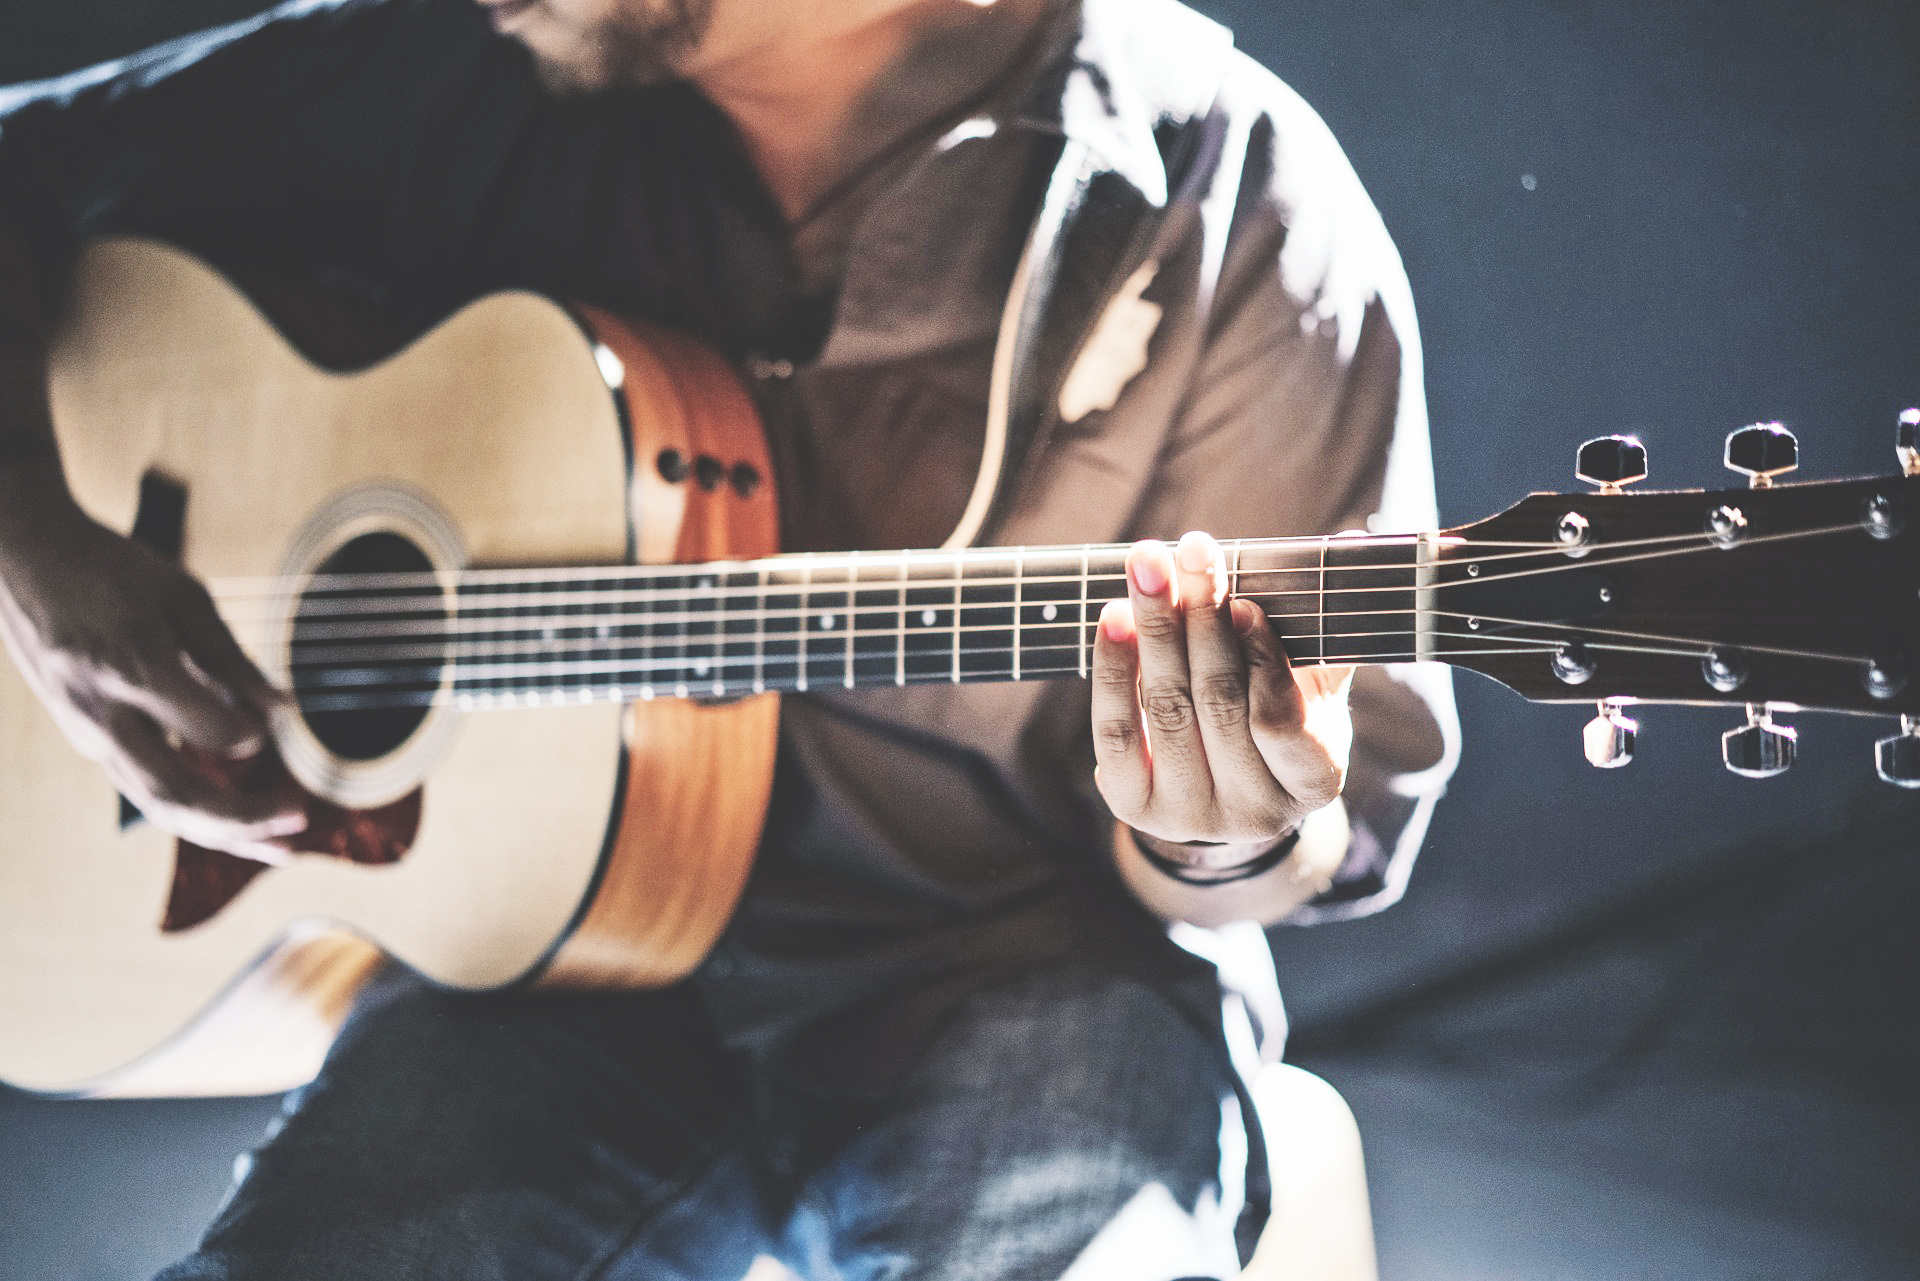 Man_Guitar.jpg